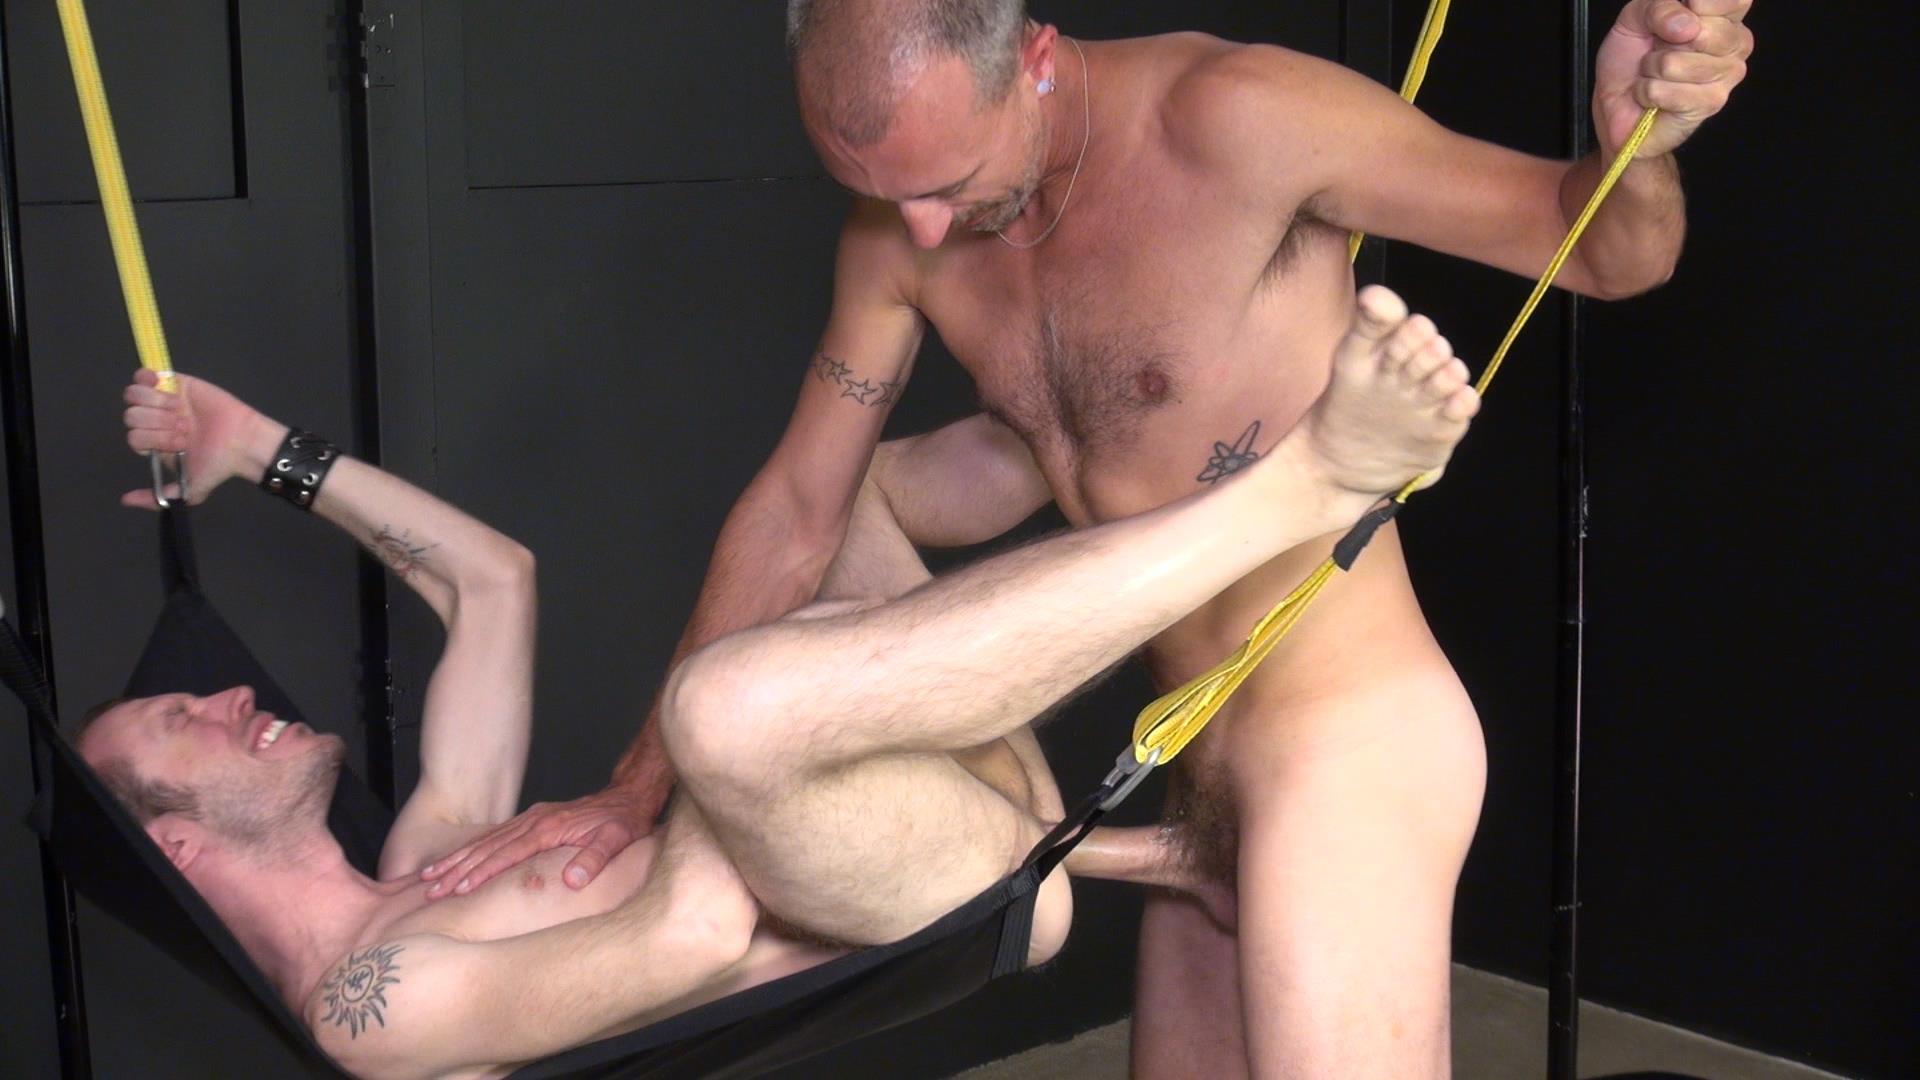 Raw and Rough Blake Dawson and Super Steve Horse Cock Bareback Breeding Amateur Gay Porn 07 Huge Cock Bareback Breeding A Tight Hole In A Sex Sling